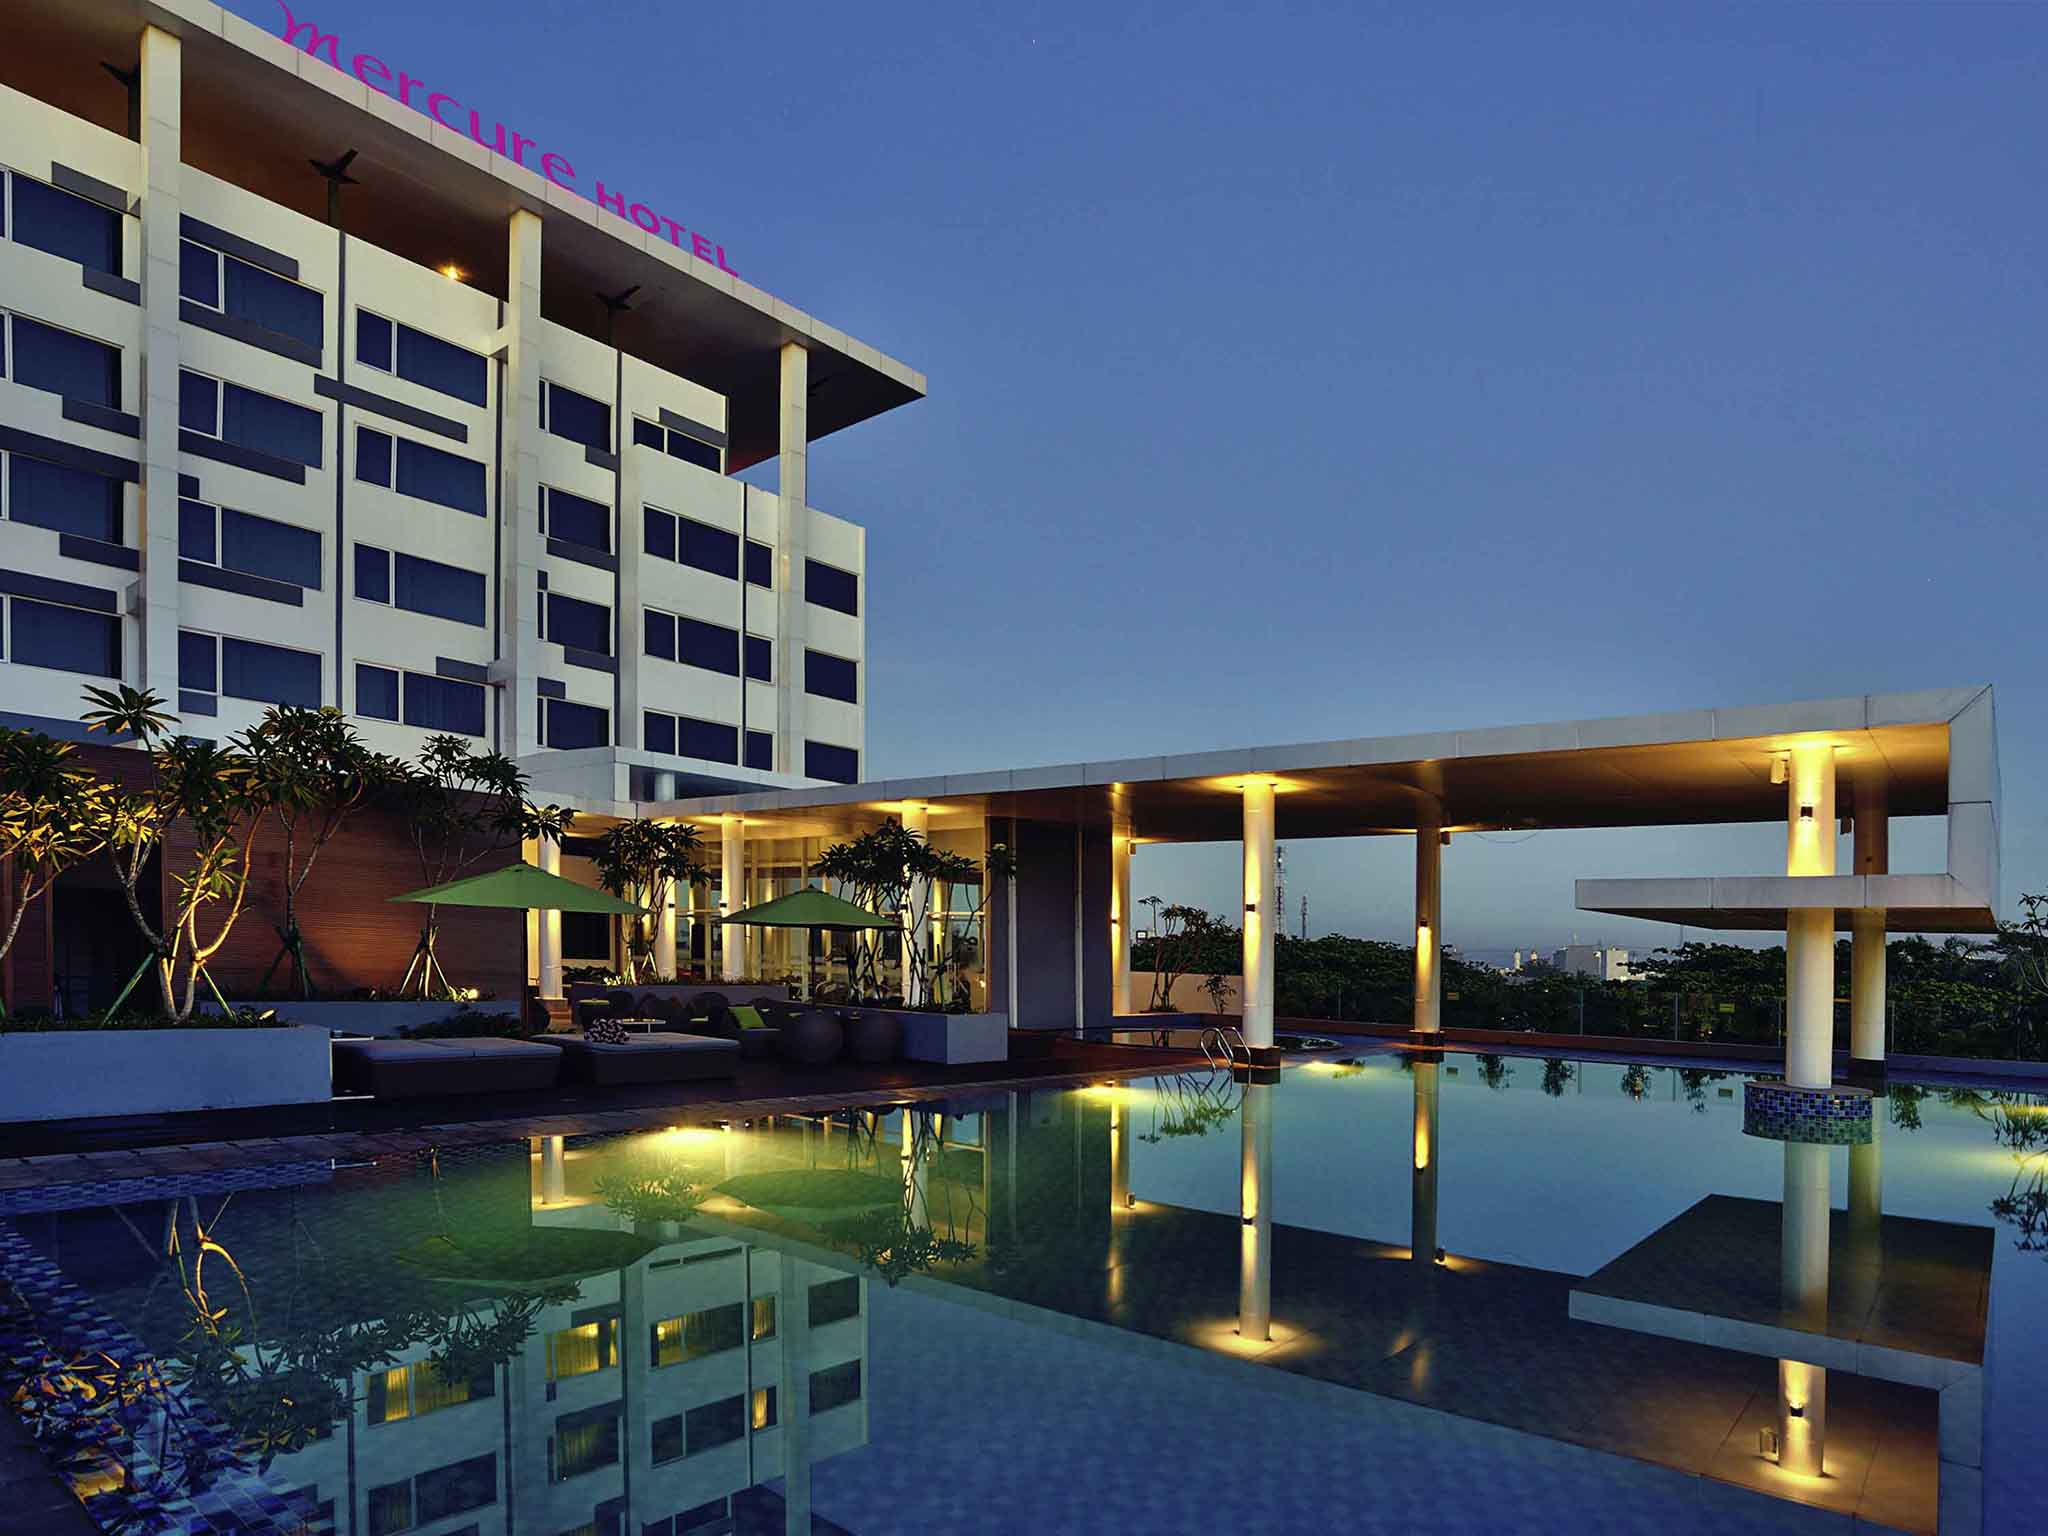 Mercure serpong alam sutera 4 star international hotel hotel mercure serpong alam sutera thecheapjerseys Choice Image